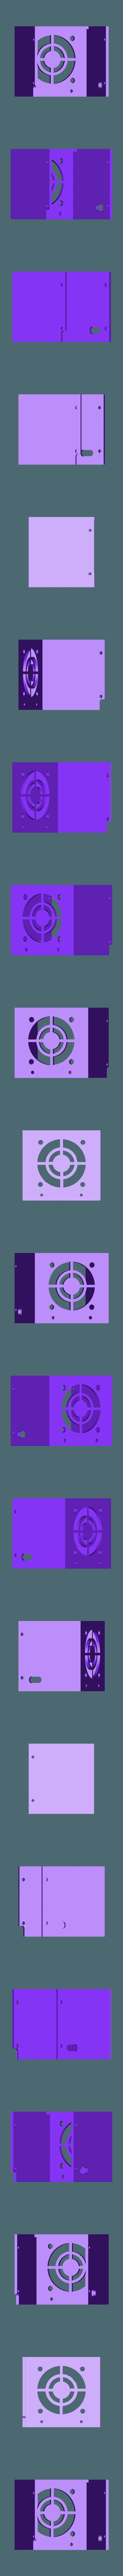 Tevo_Dual_fan_cover.STL Download free STL file Tevo Tornado Dual extruder mod • 3D printing model, johnnycope